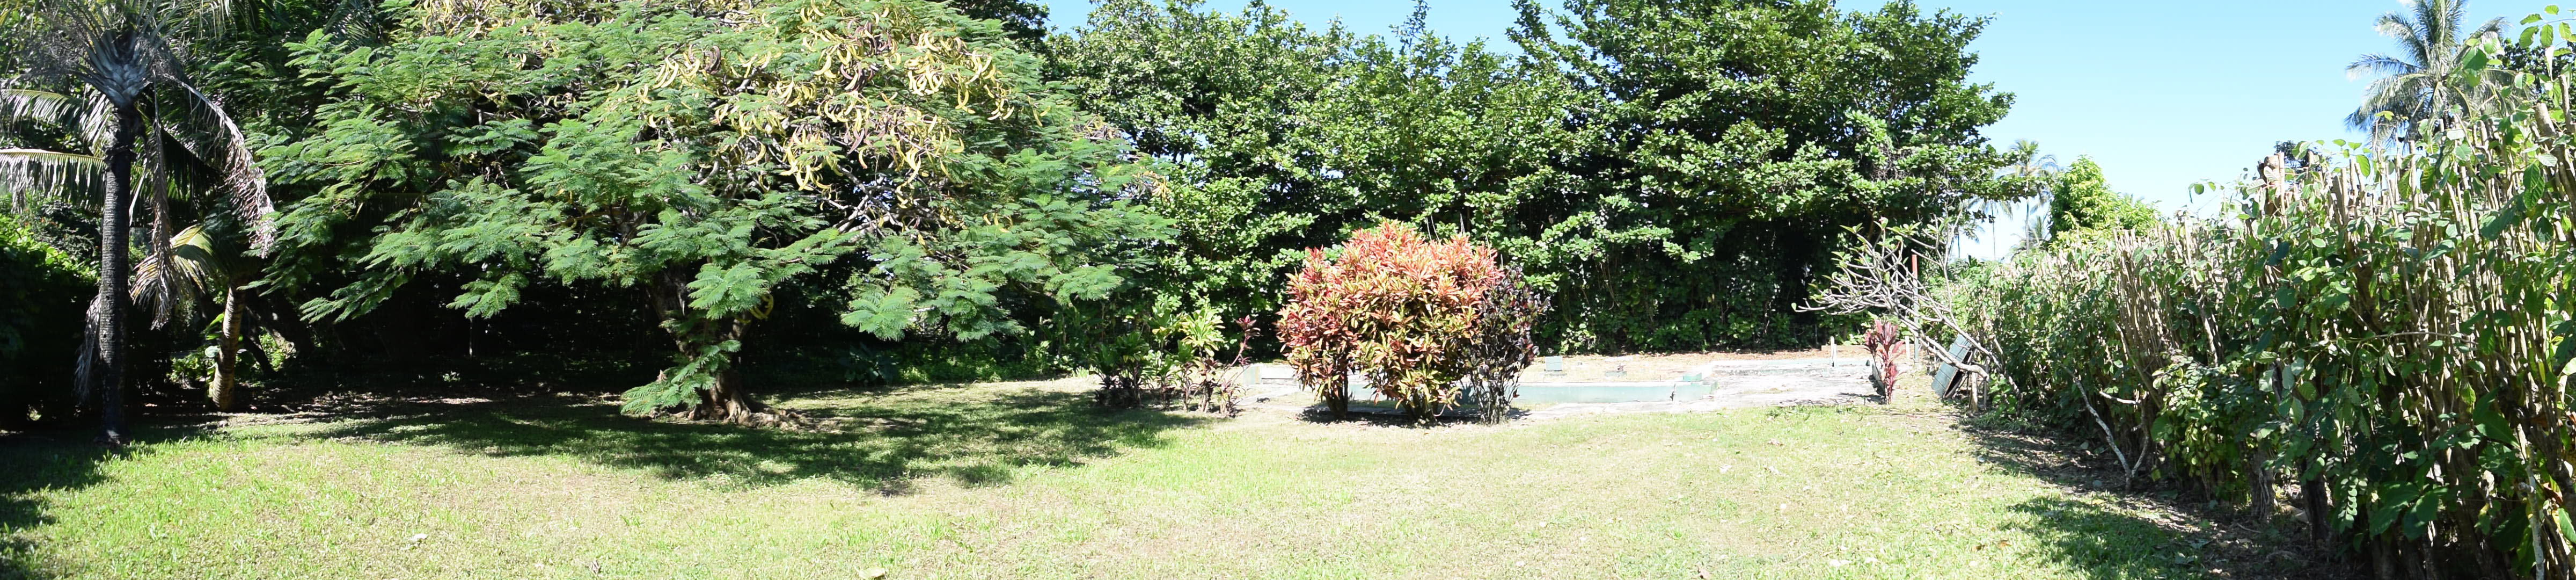 PANO Haena Land For Sale Hanalei Kauai North Shore Money